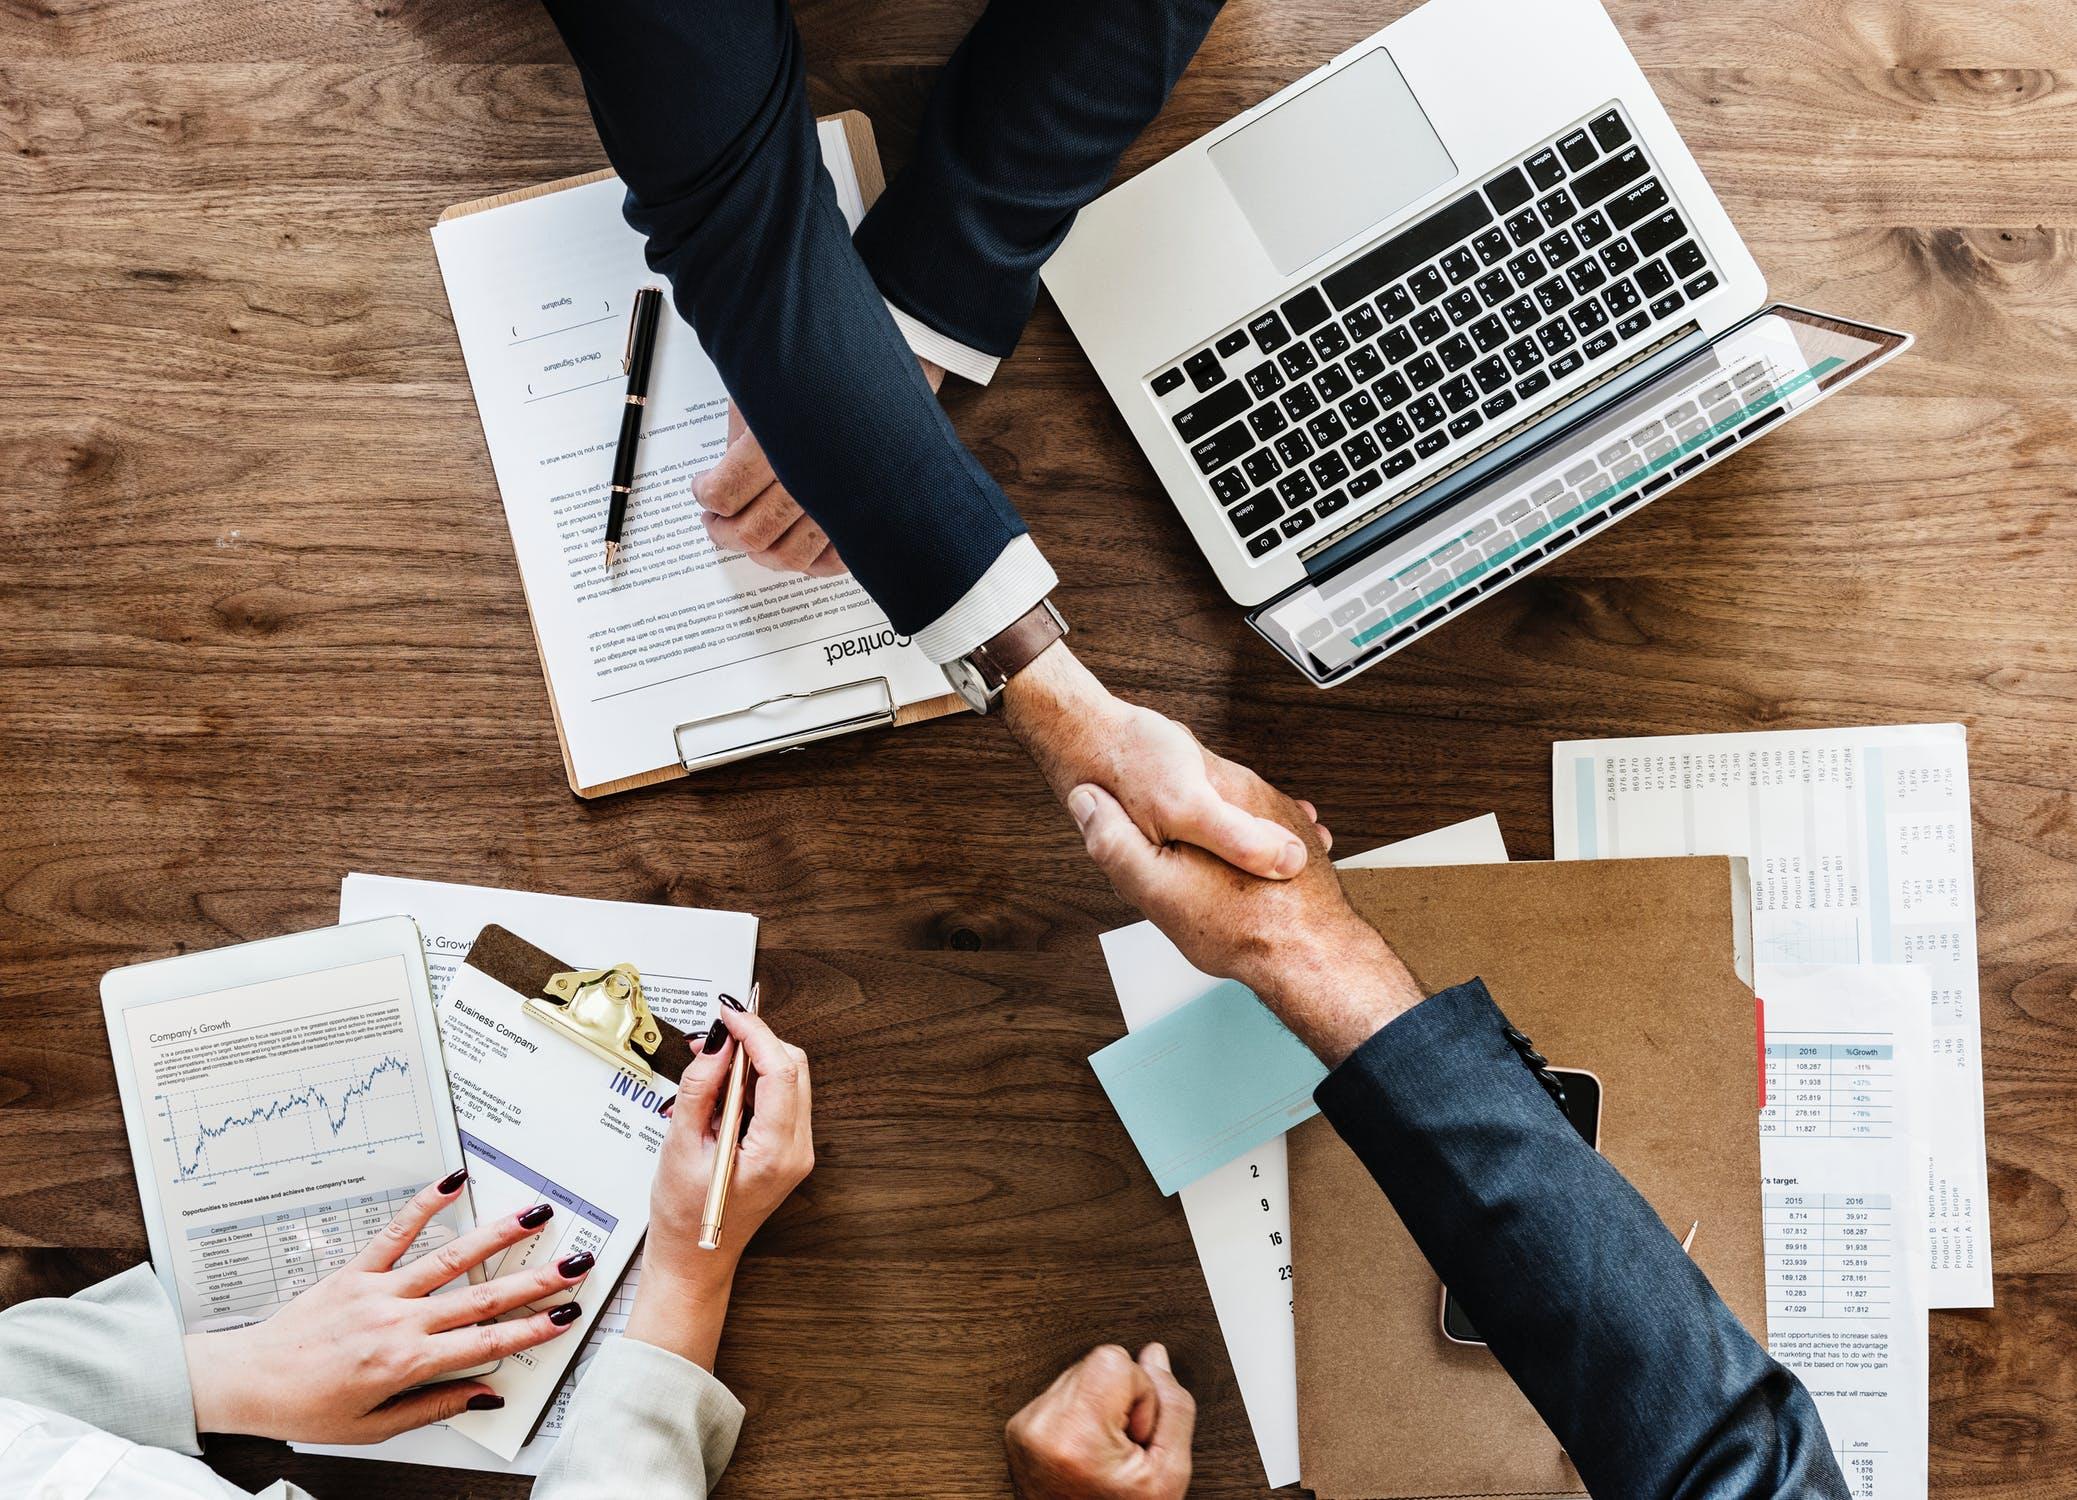 Telecom & IT Customer Service Redefined - The Agent Advisor